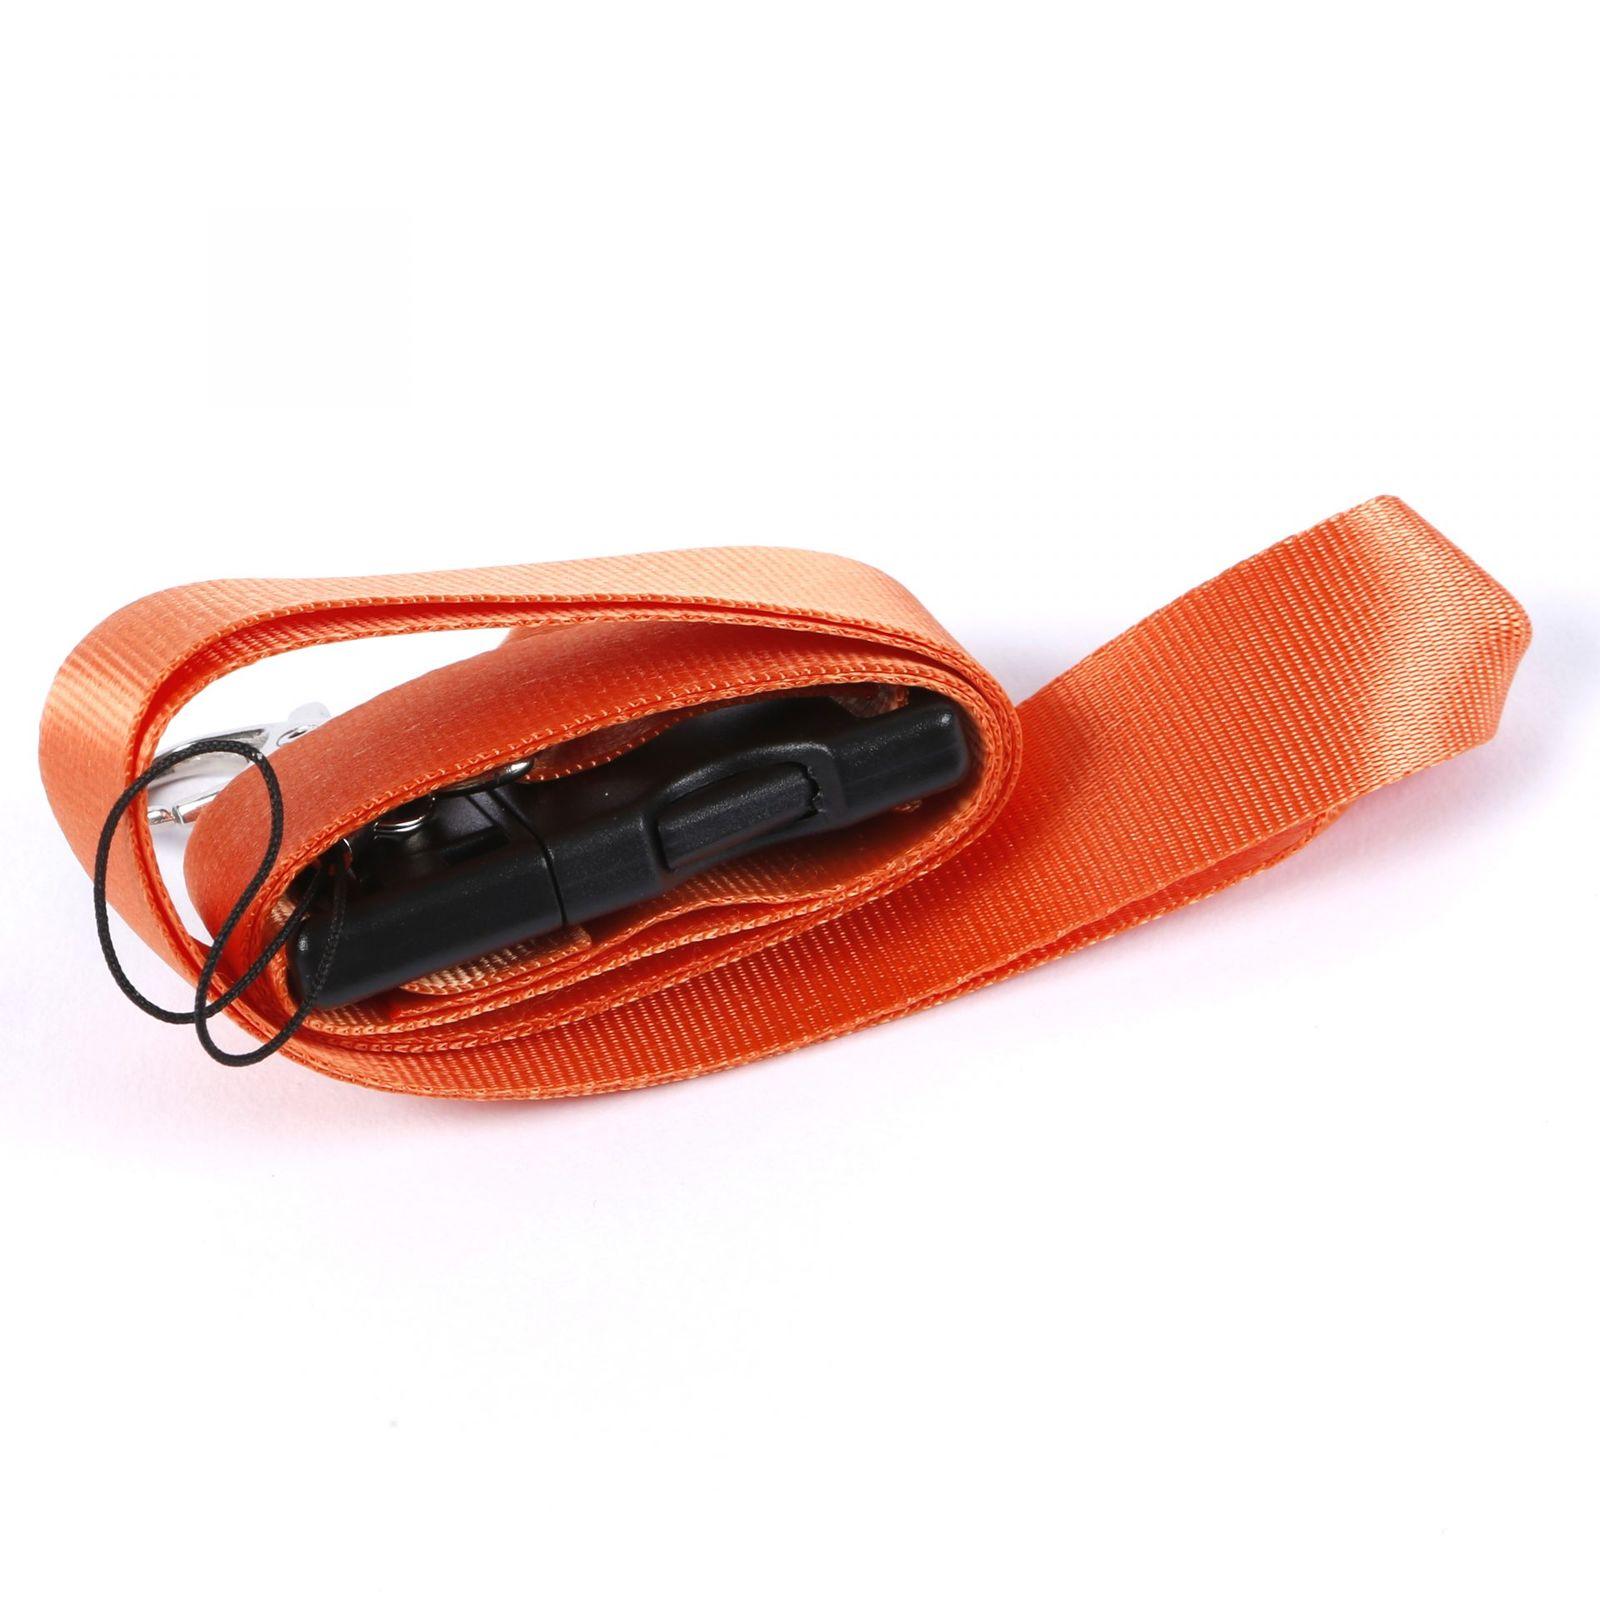 Buy Premium USB Lanyards on Lanyards Direct Today!